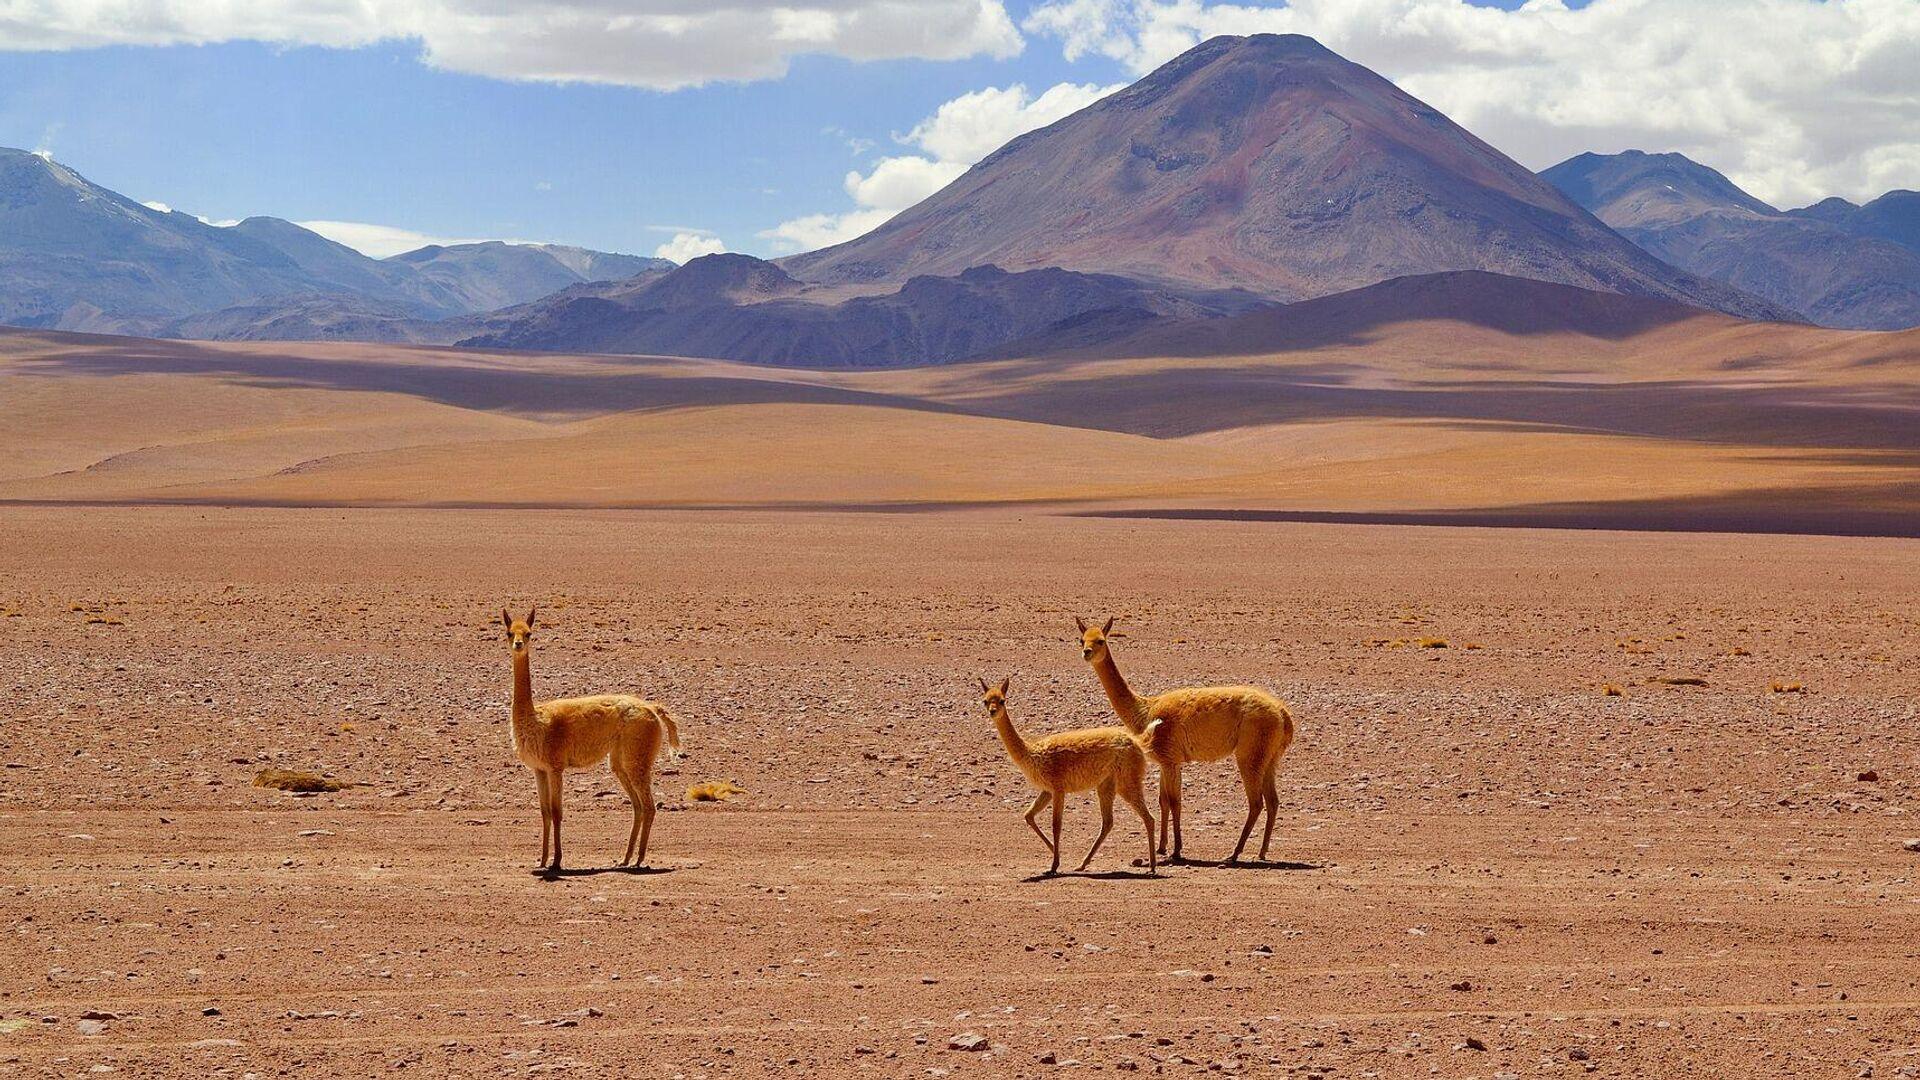 Пустыня Атакама в Чили - РИА Новости, 1920, 05.01.2021